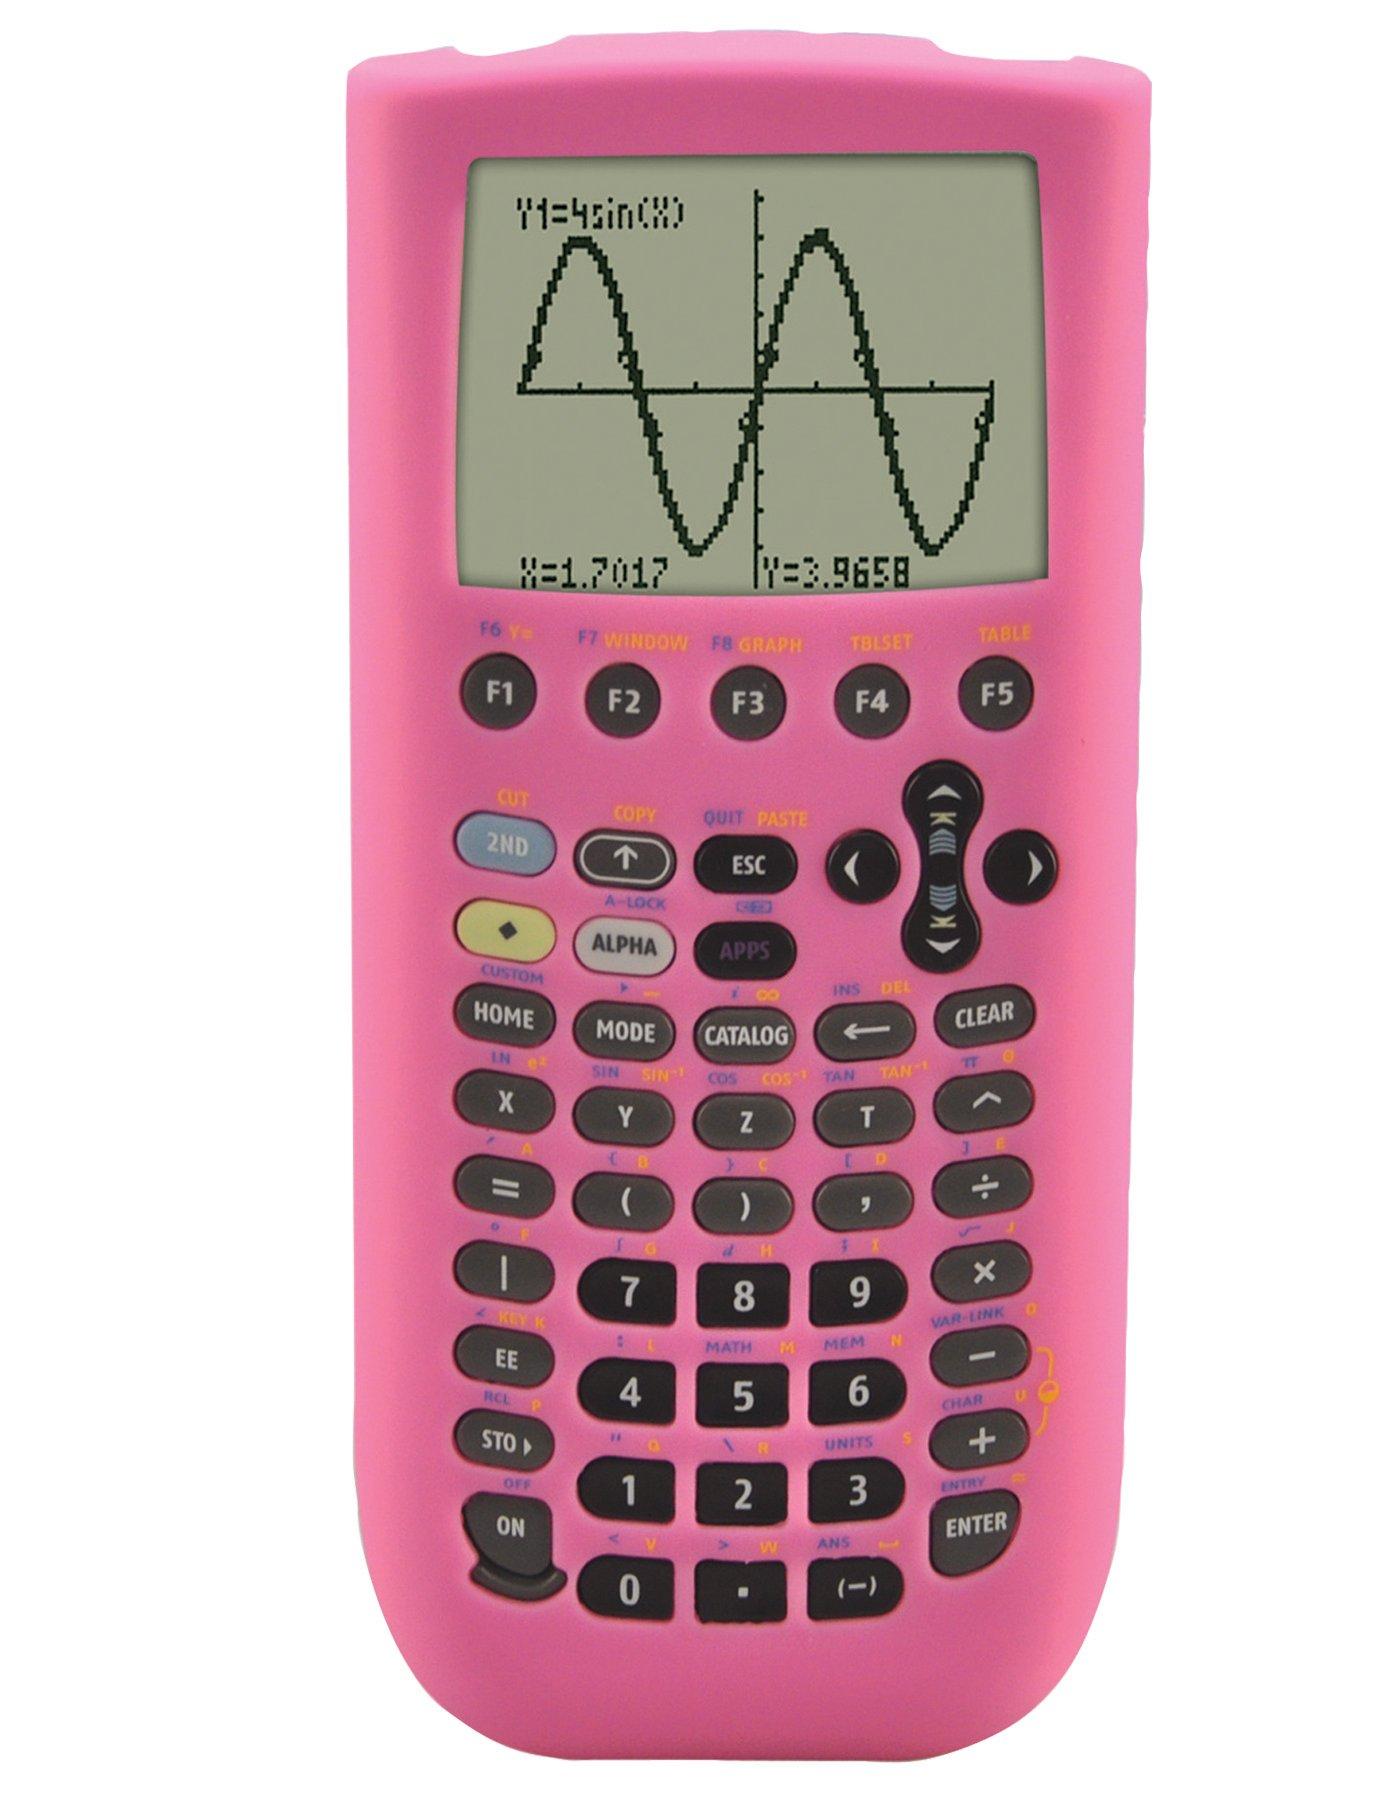 Guerrilla Silicone Case for Texas Instruments TI-89 Titanium Graphing Calculator, Pink